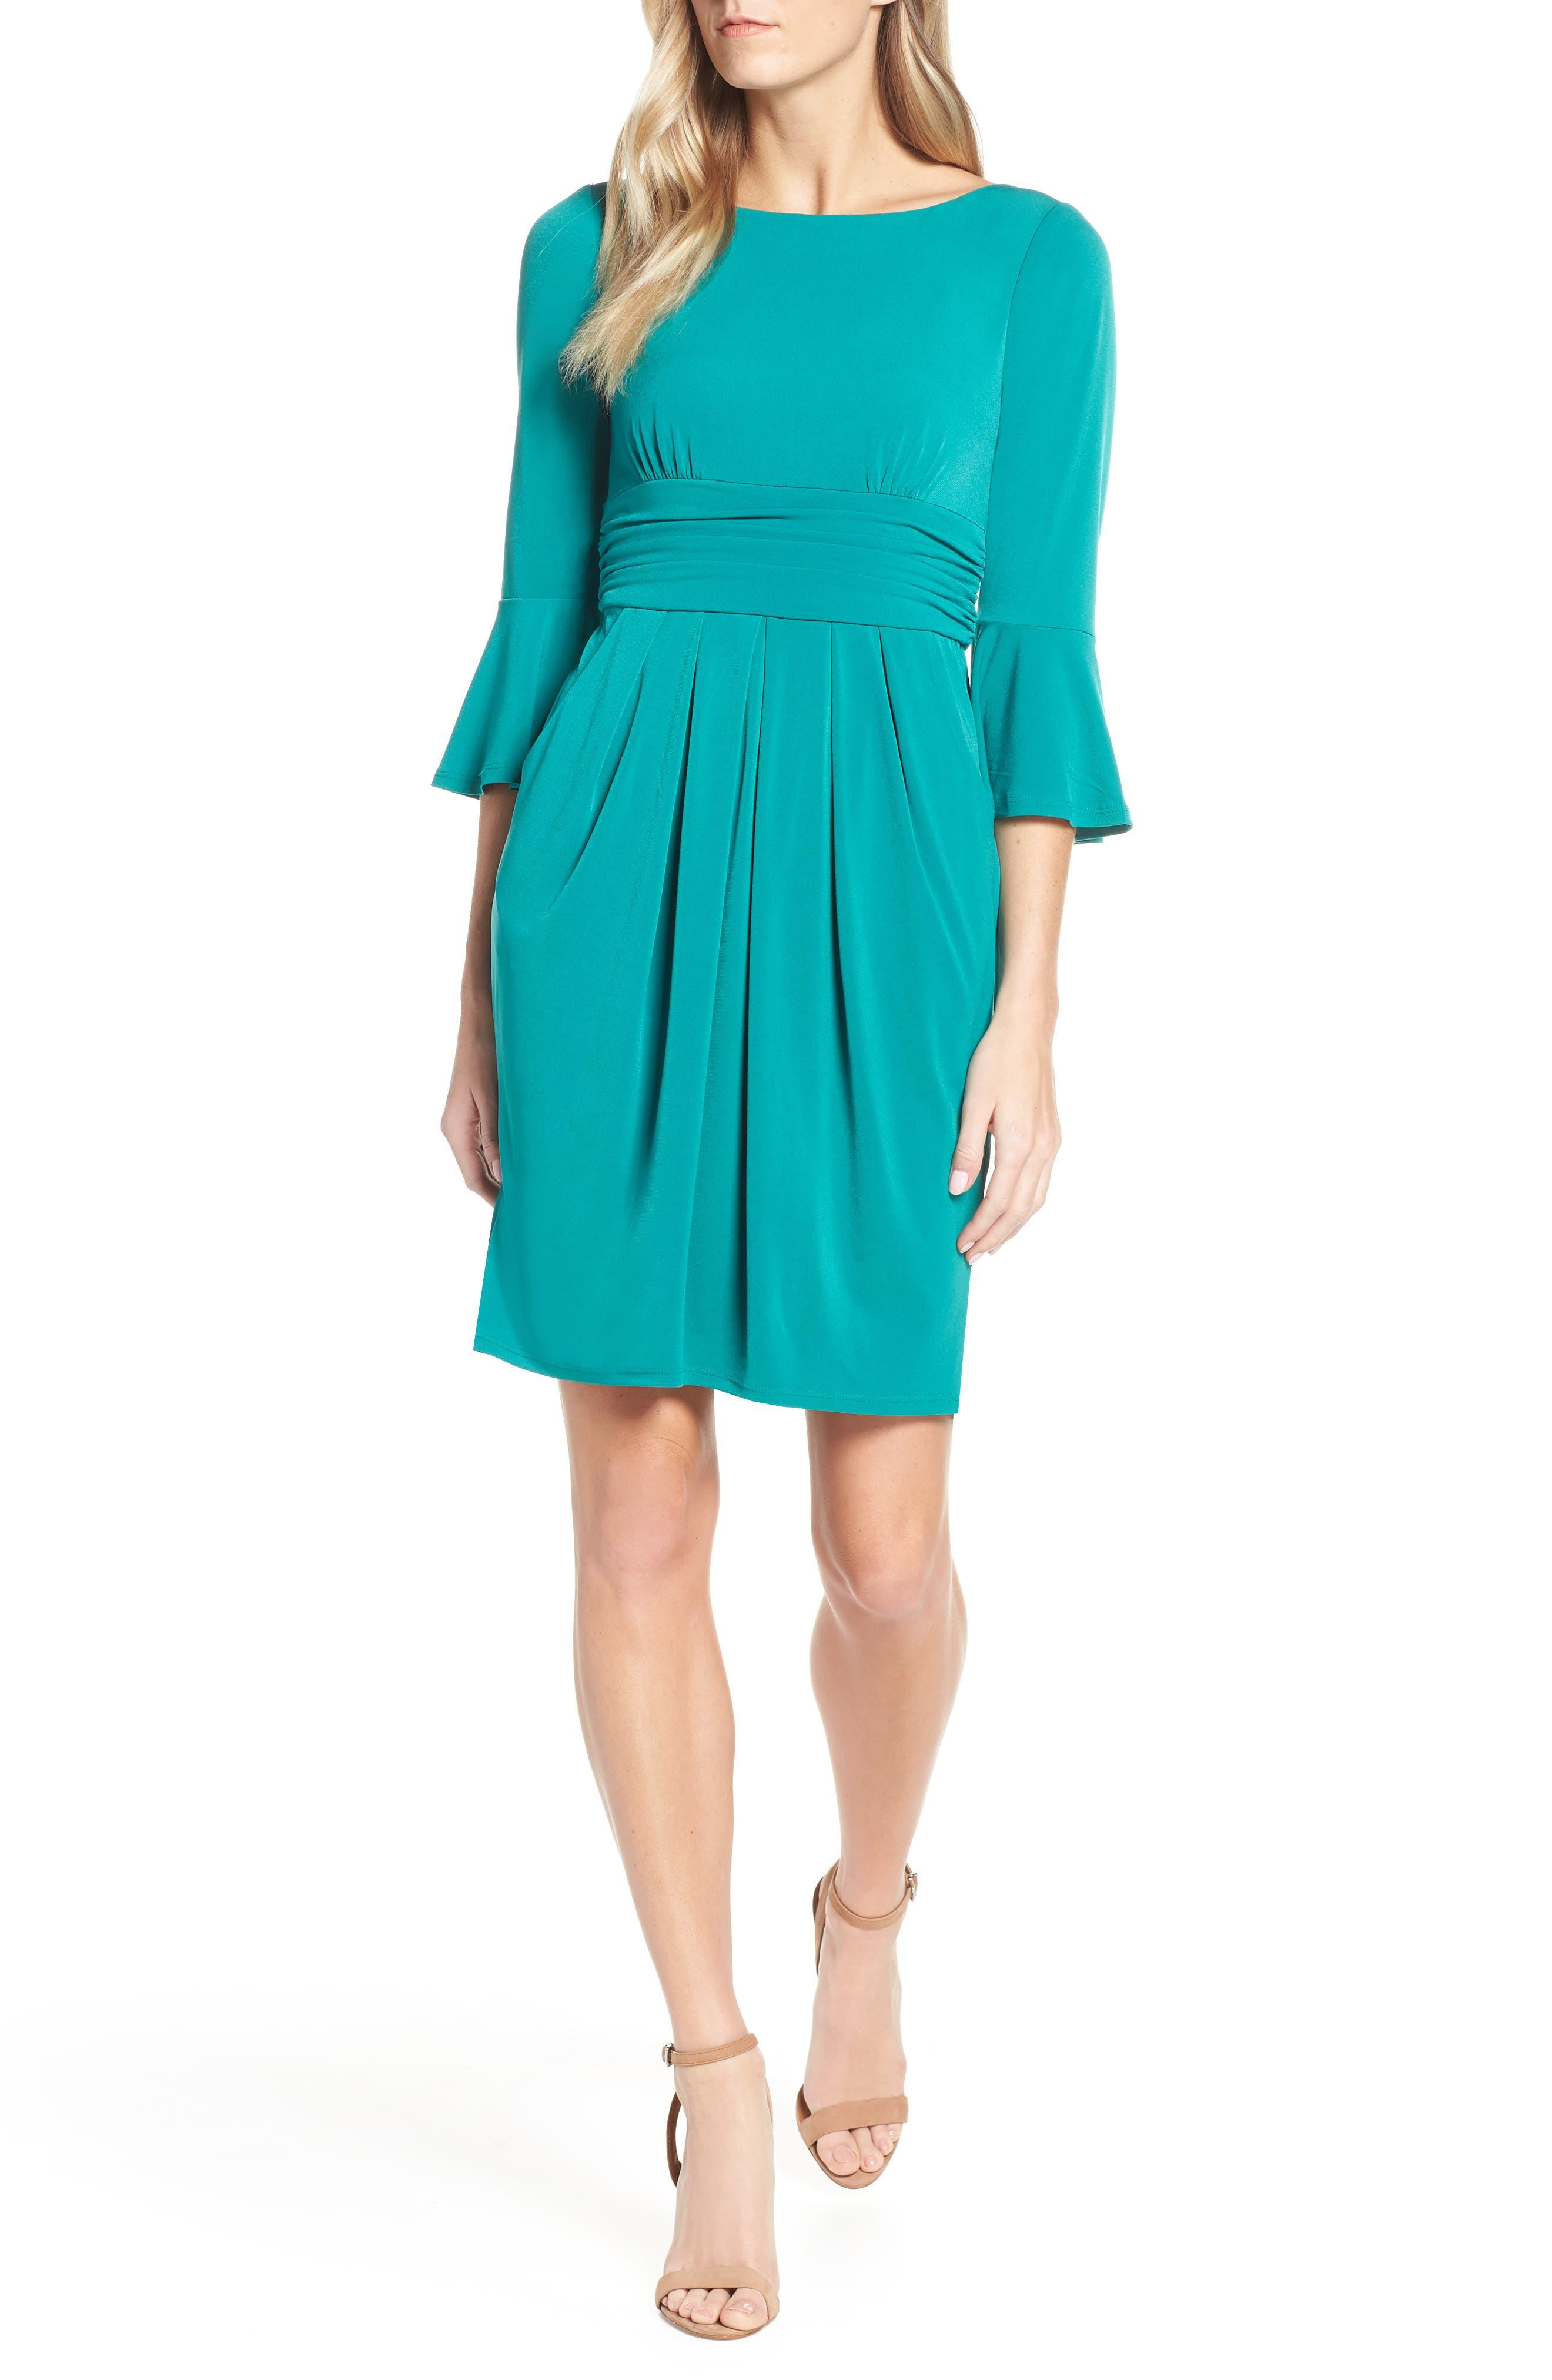 Eliza J Bell Sleeve Knit Sheath Dress, 8 (similar to 1) - Green